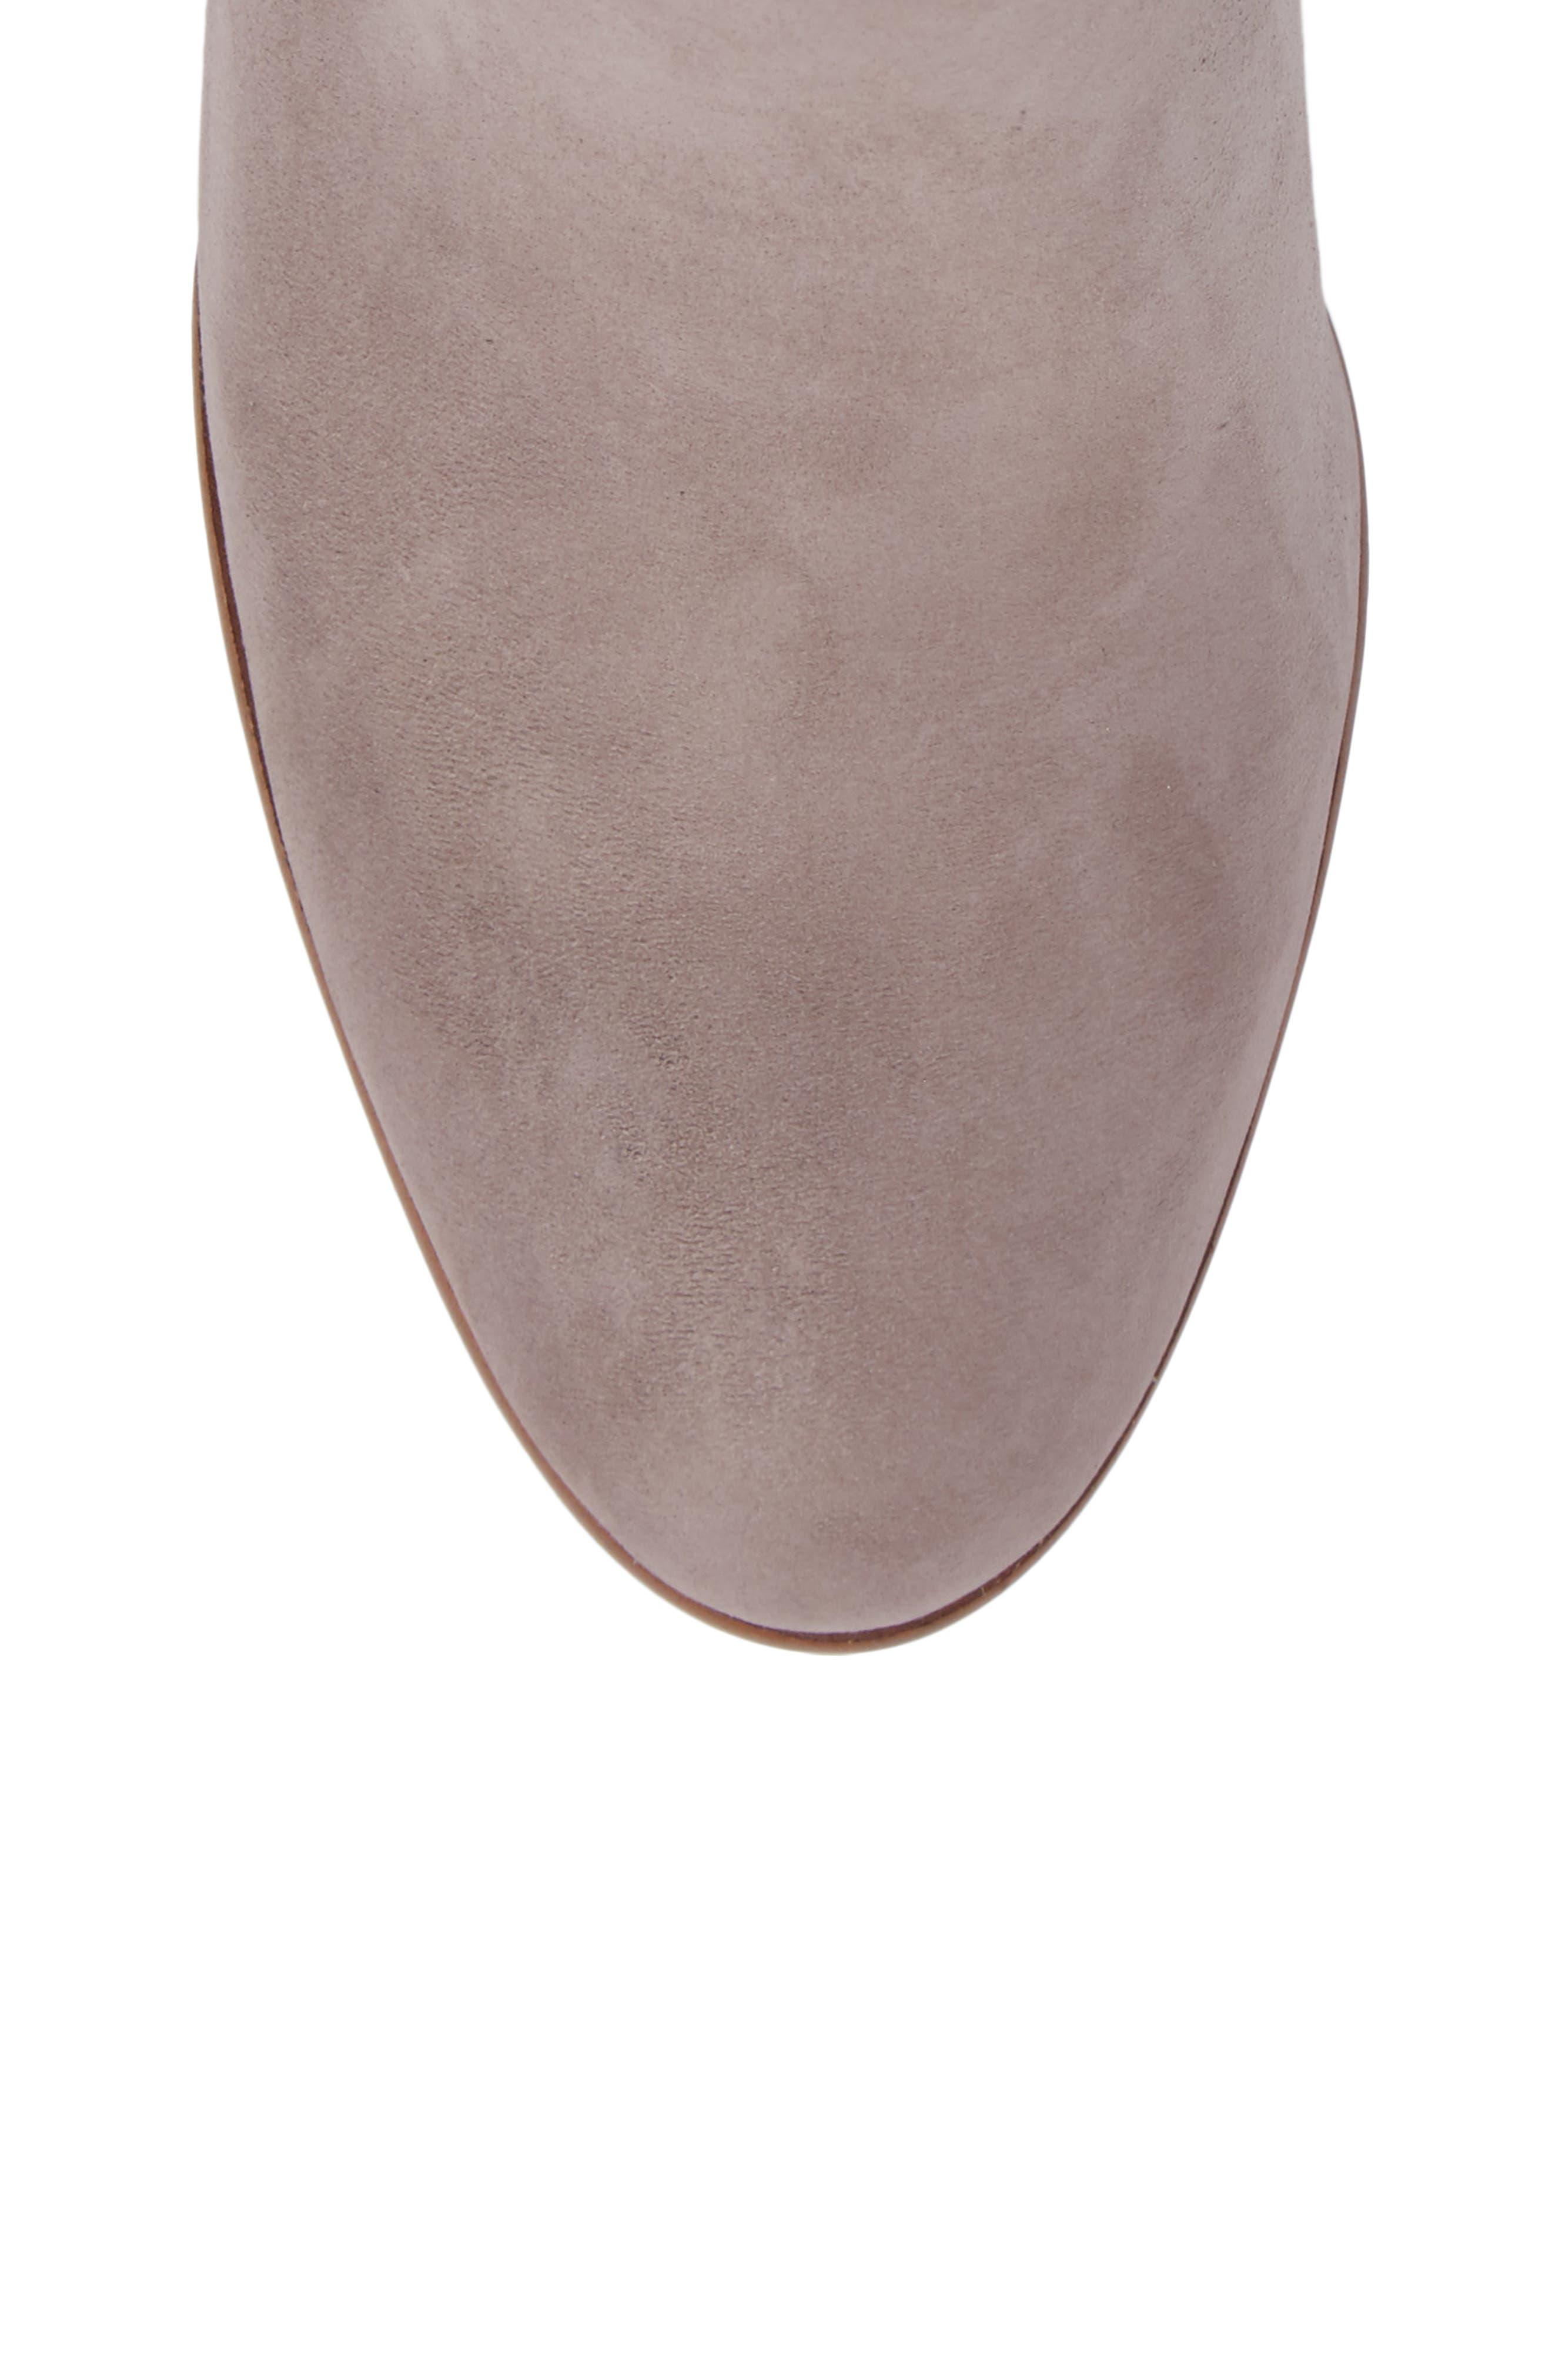 Zanara Bootie,                             Alternate thumbnail 5, color,                             Gravel Leather